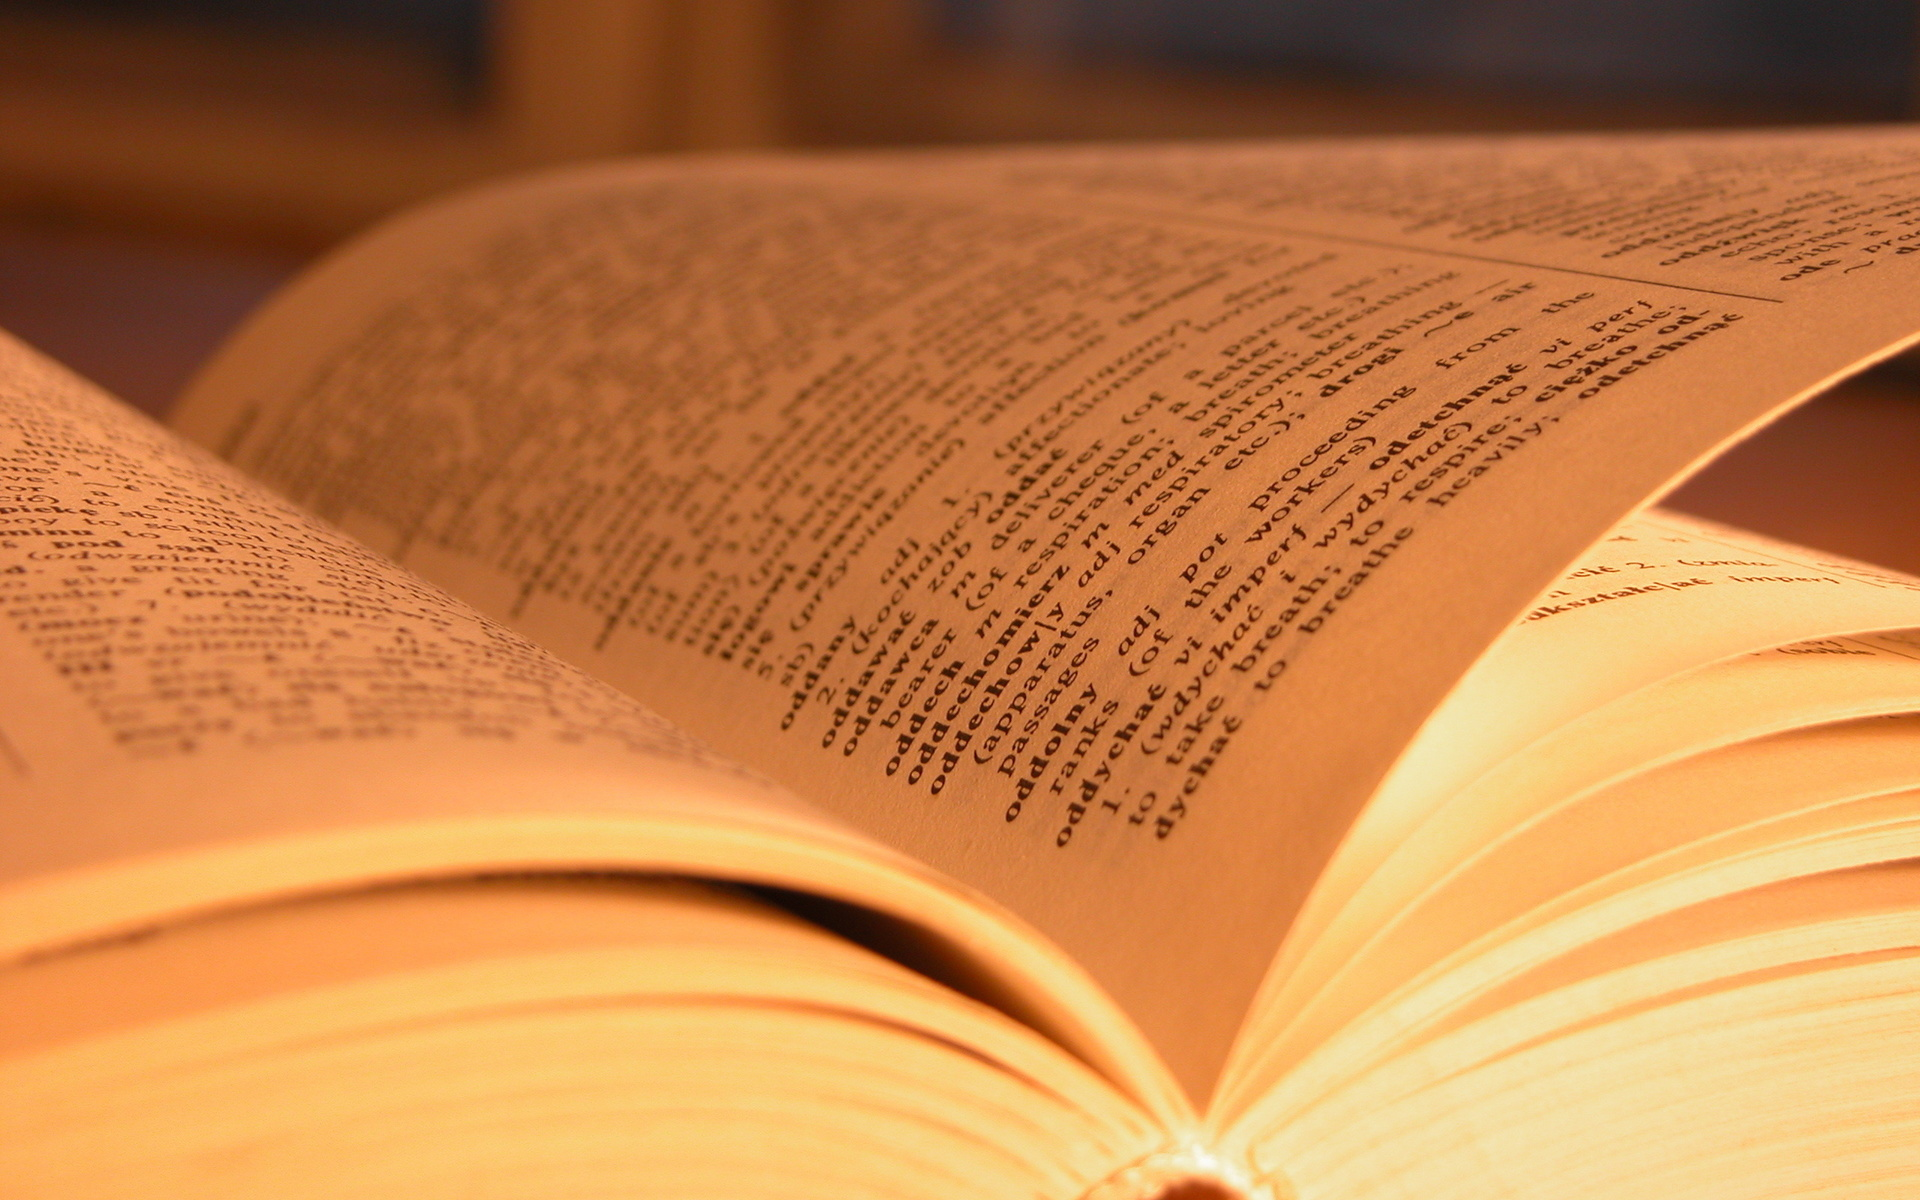 Бумага книги картинки